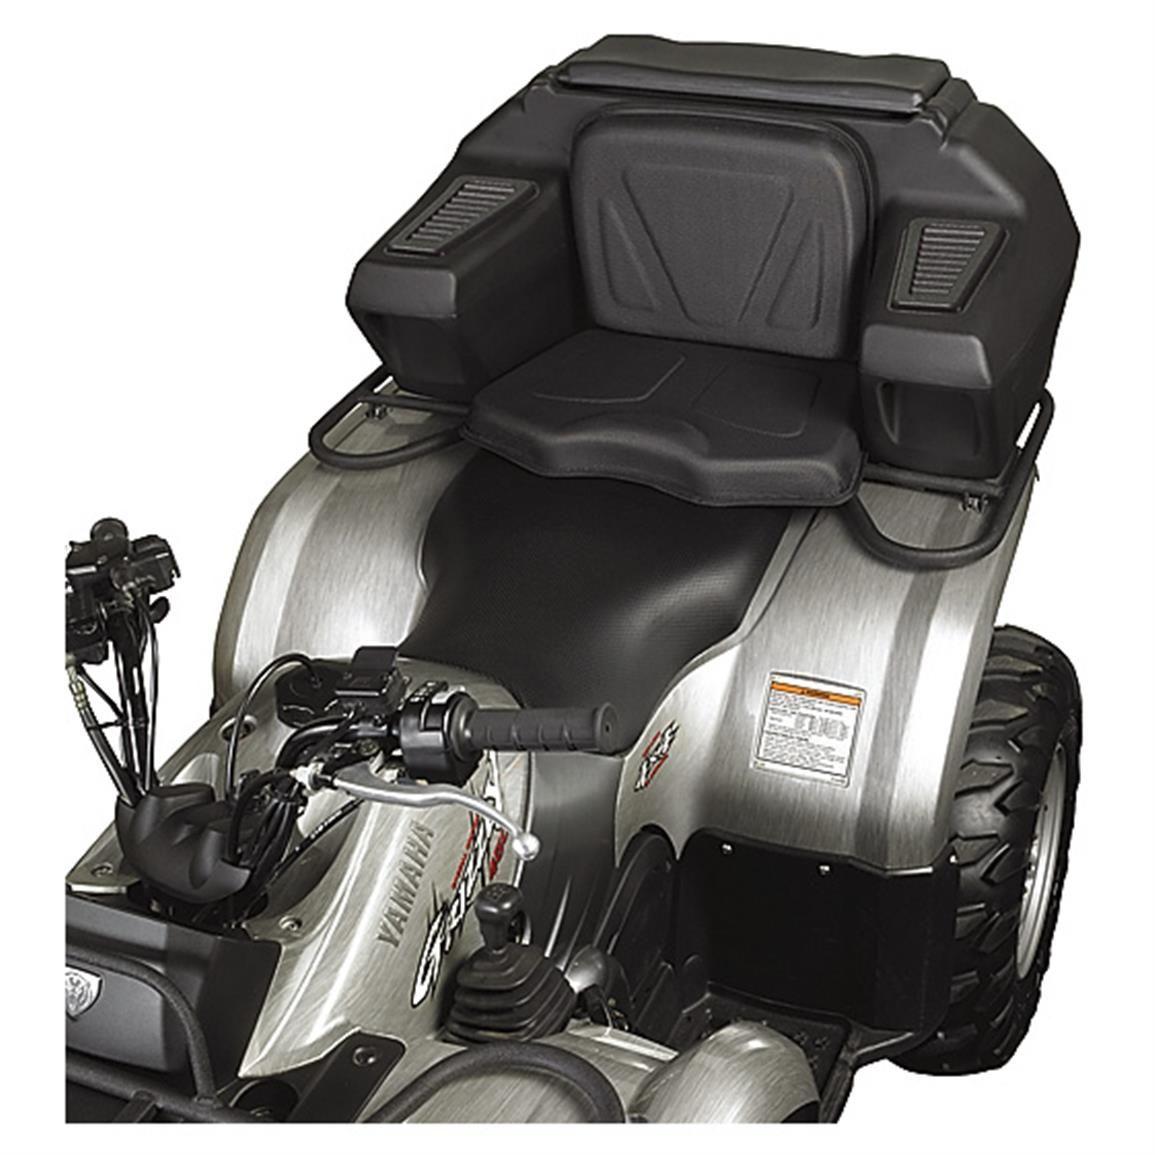 Kolpin ATV Rear Lounger with Lockable Helmet Storage Box | Pinterest ...